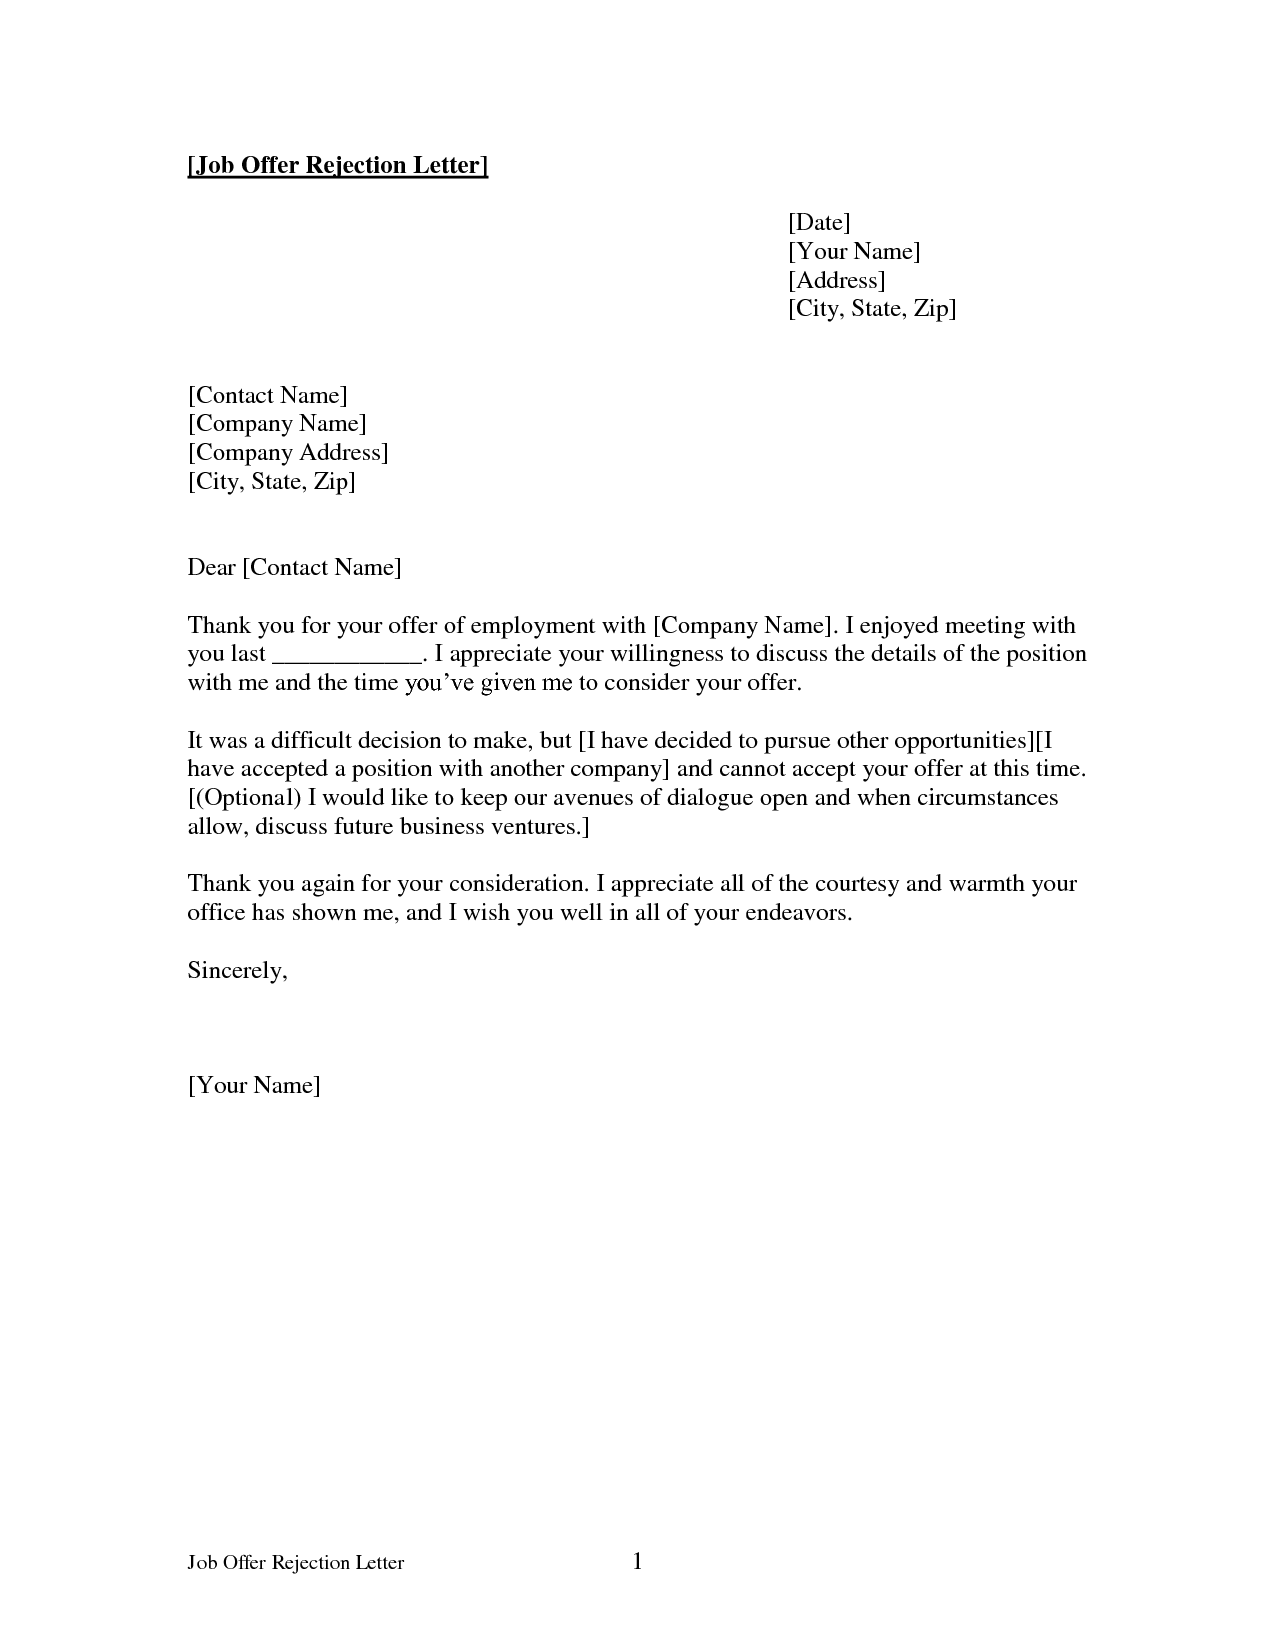 Free Sample Letter Effective Letter Writing Tips Learn Letter Writing Business Letter Format Business Letter Format Job Letter Letter Example